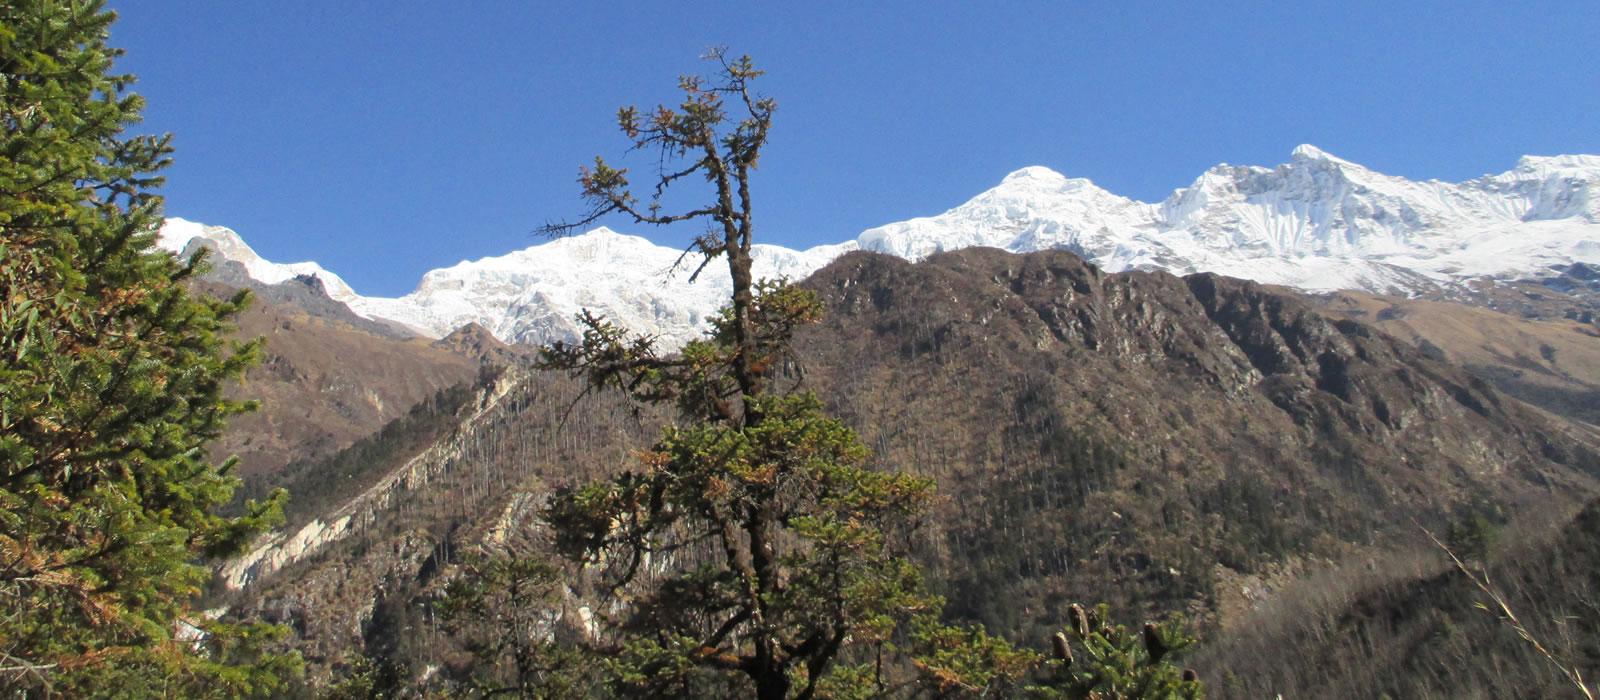 Ganesh Himal Ruby Valley Trekking